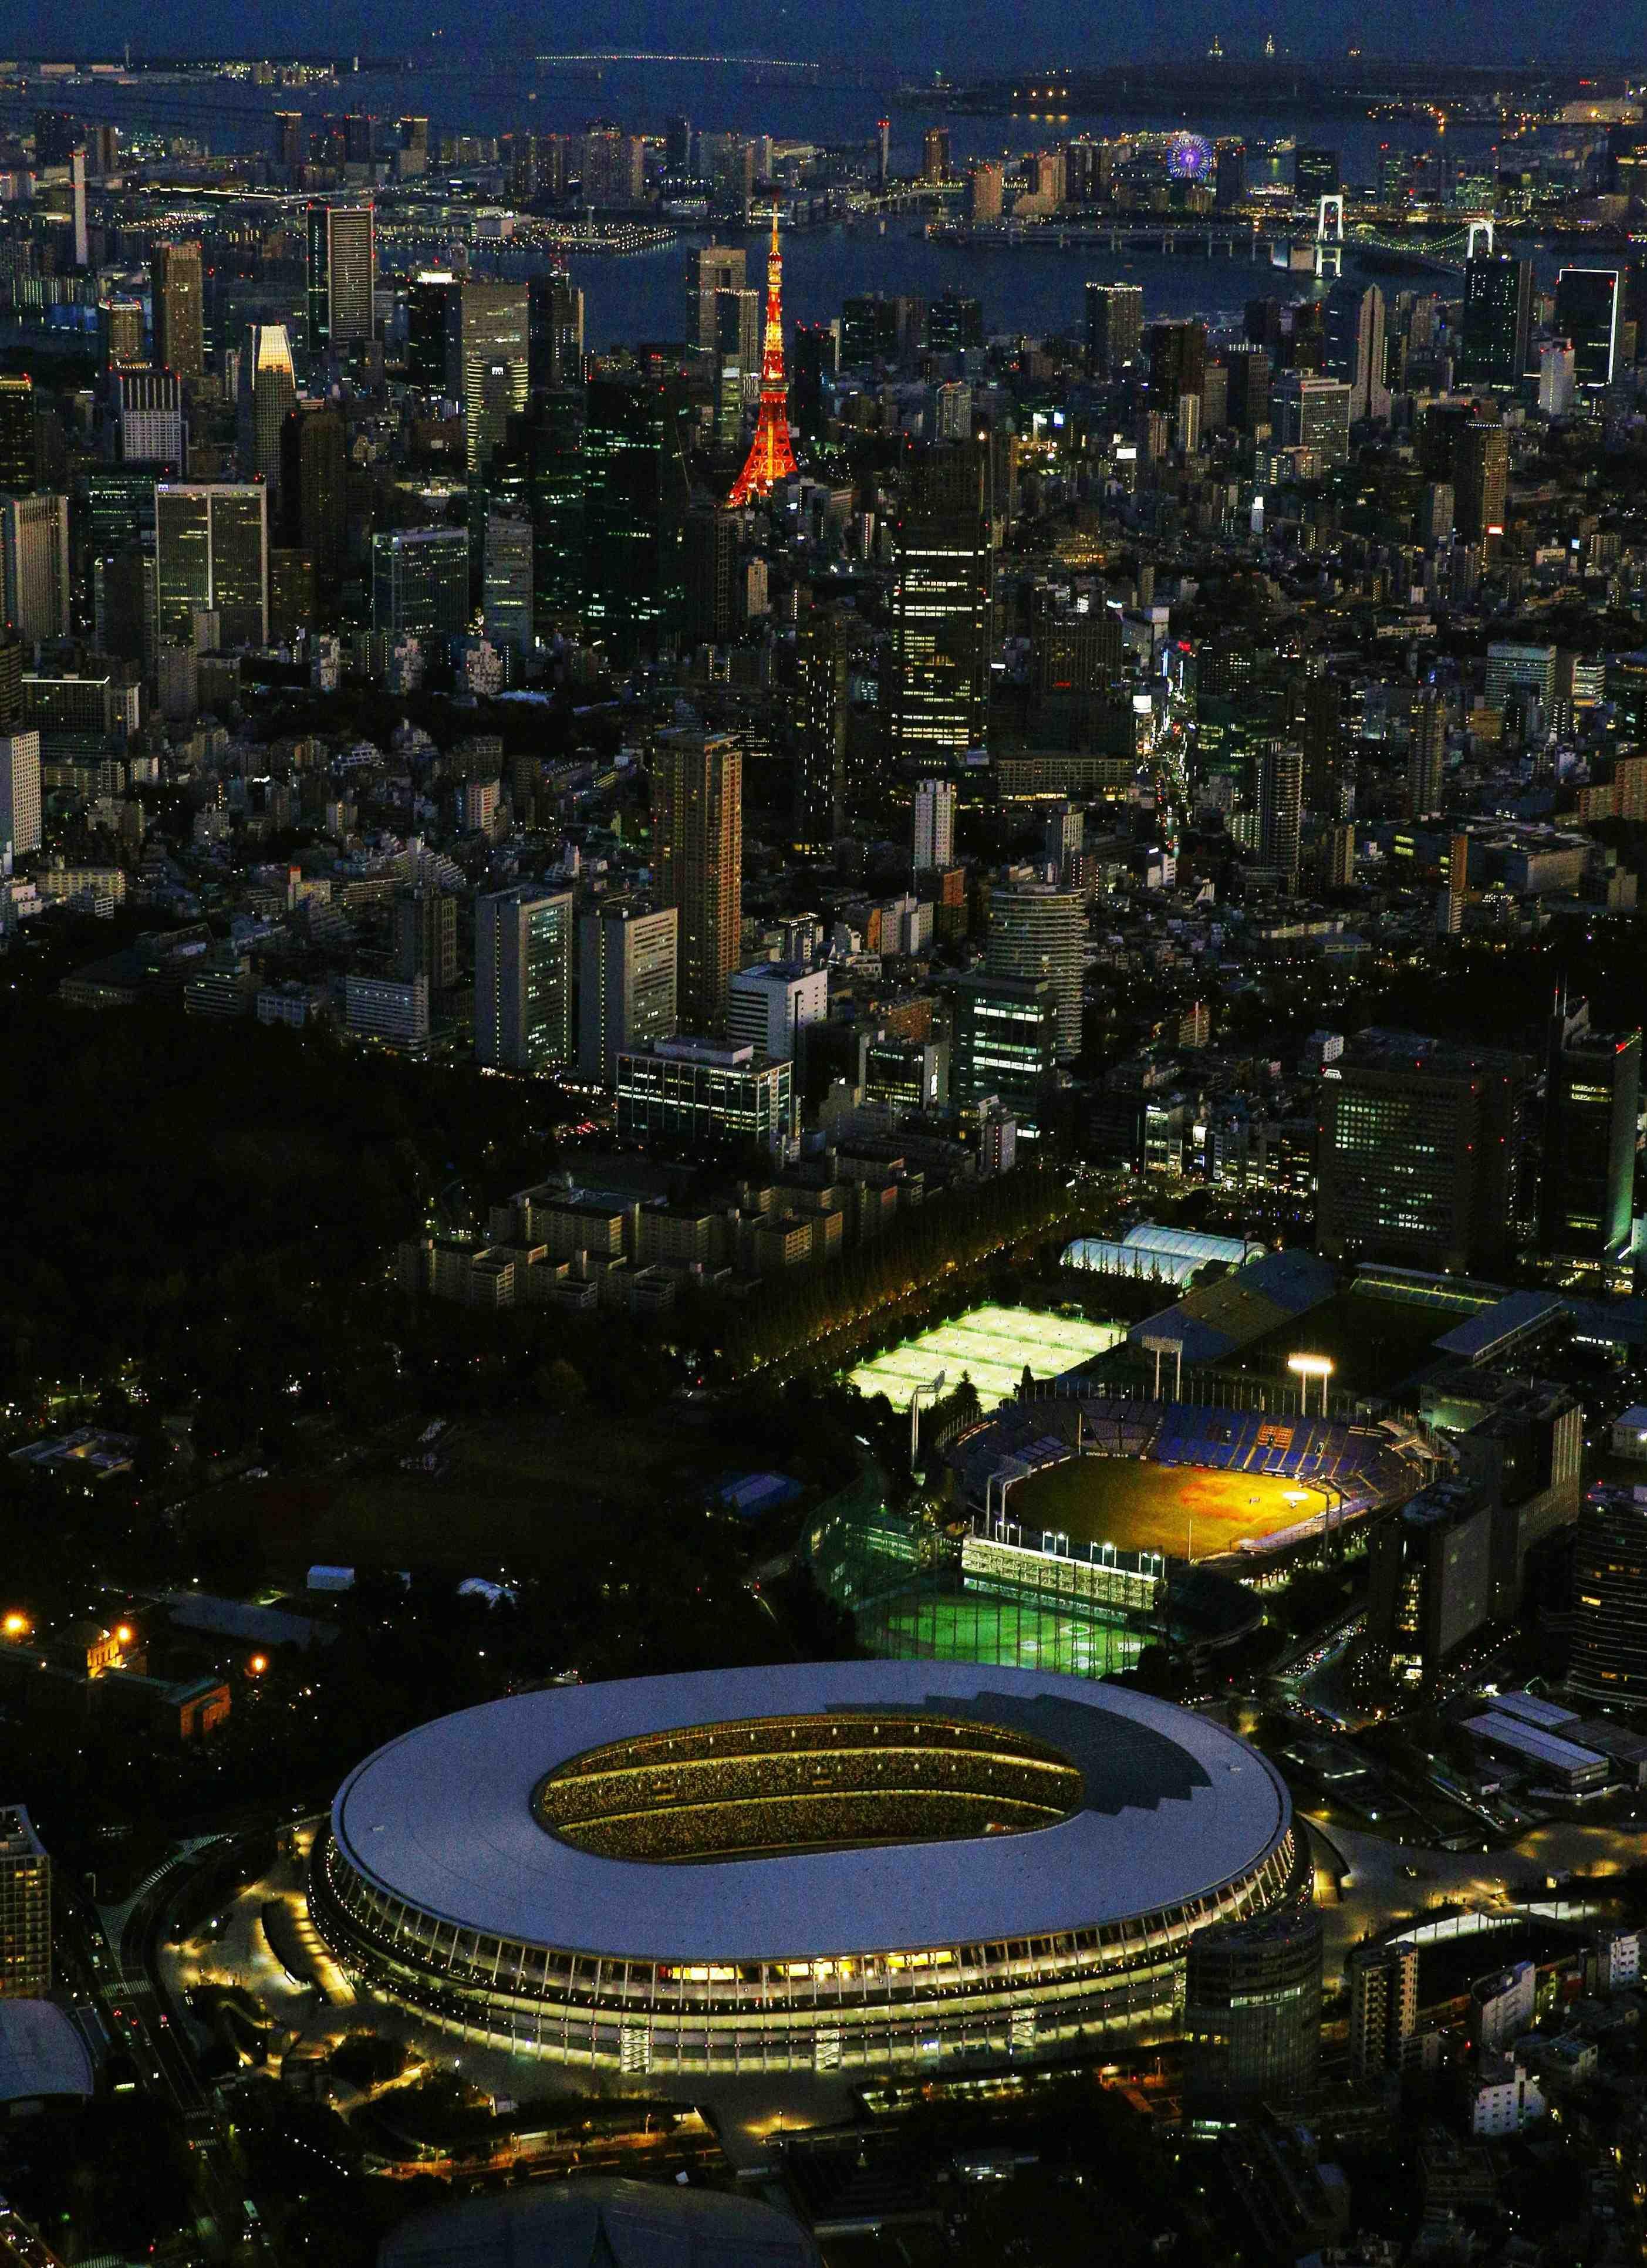 Japan New National Stadium Tokyo Olympics 2020 028